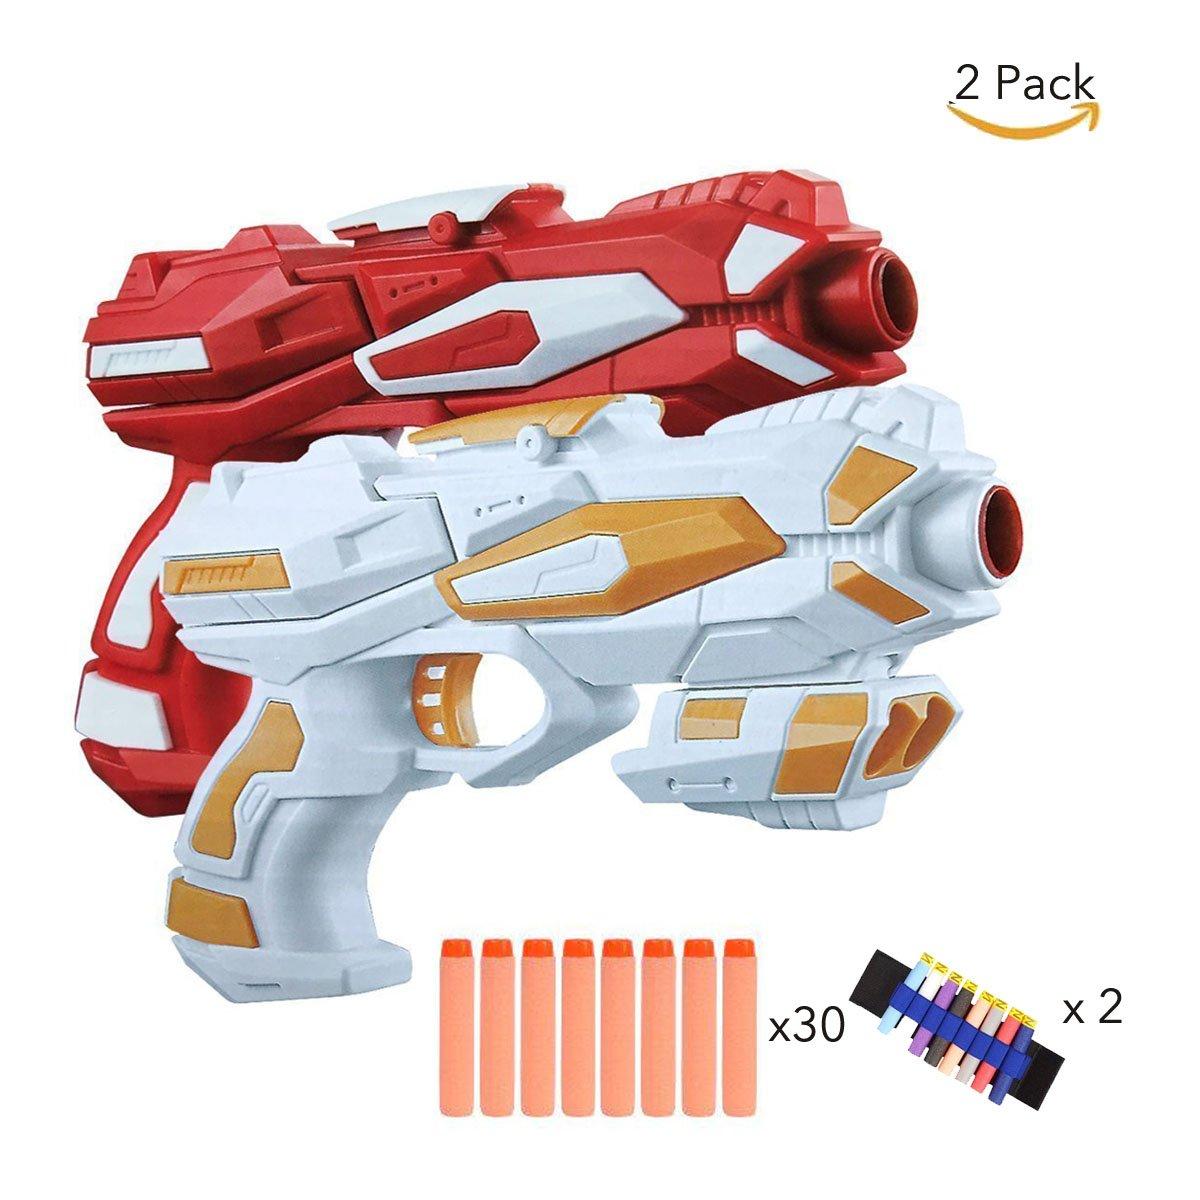 Fstop Labs 2 Pack Nerf Like Blaster Toy Gun with 2 Foam Dart Wrist Band and 30PCS Refill Soft Foam EVA Darts for Kids Hand Gun Blaster Gun Toy